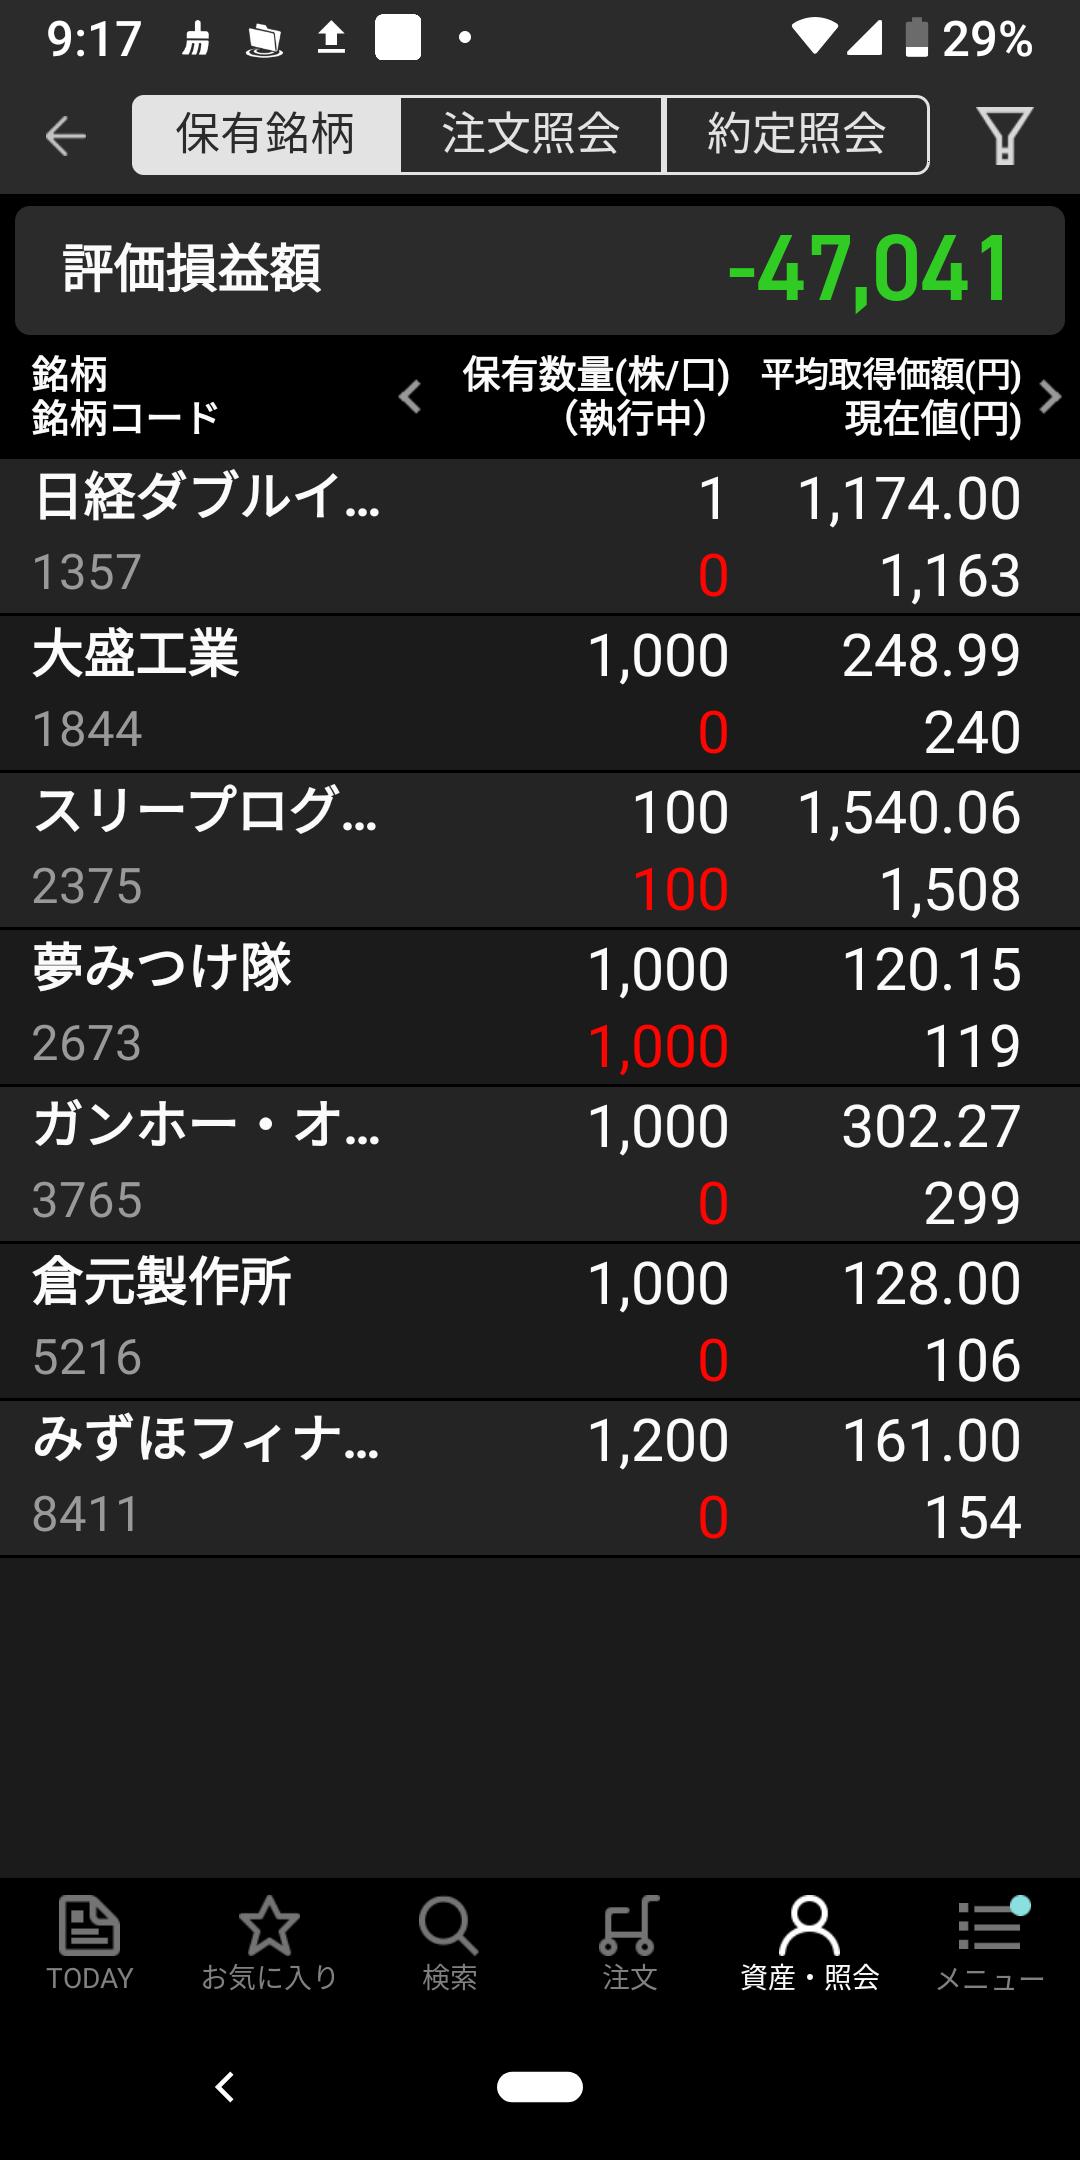 Screenshot (2019_06_25 9_17_49)